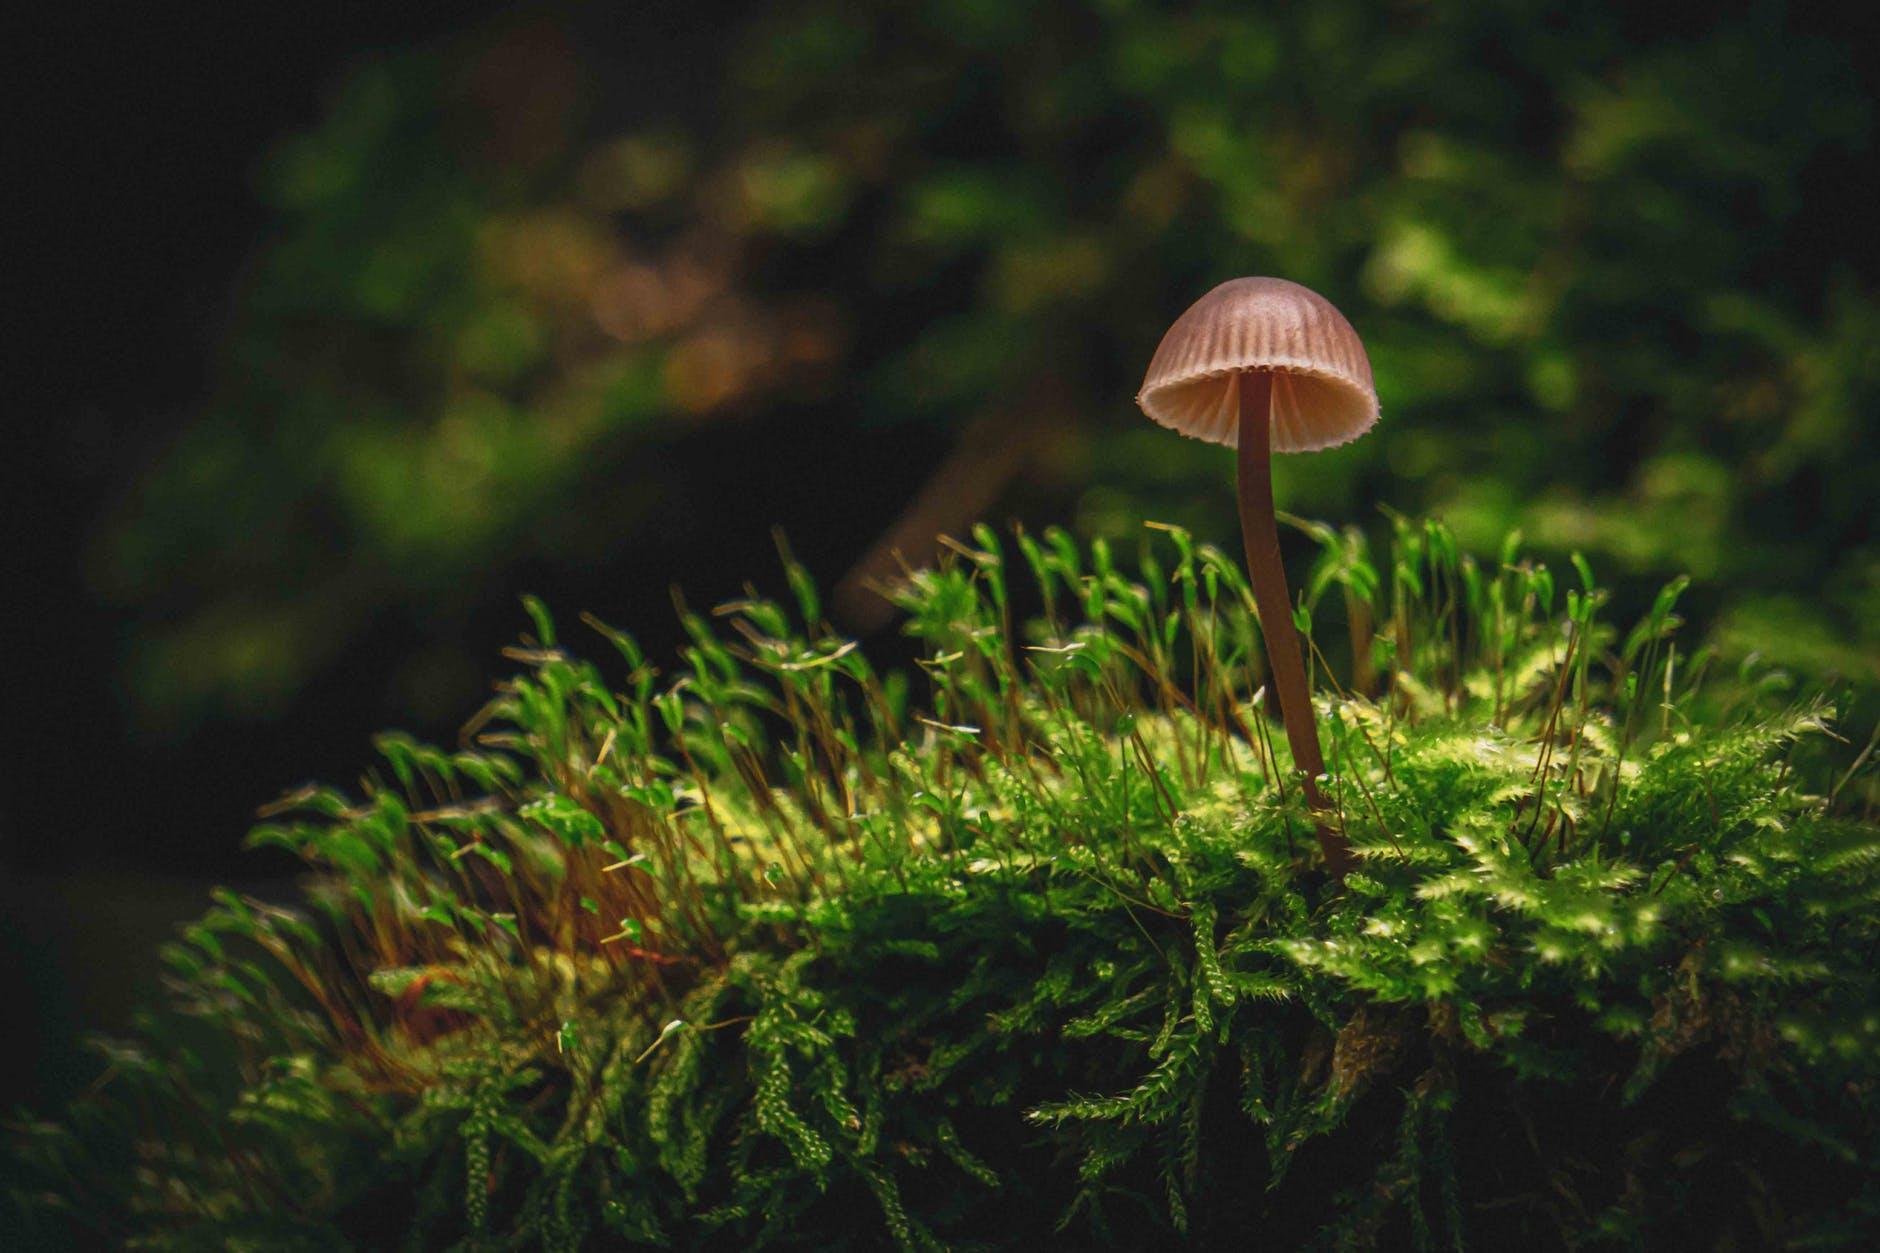 brown mushroom on green grass